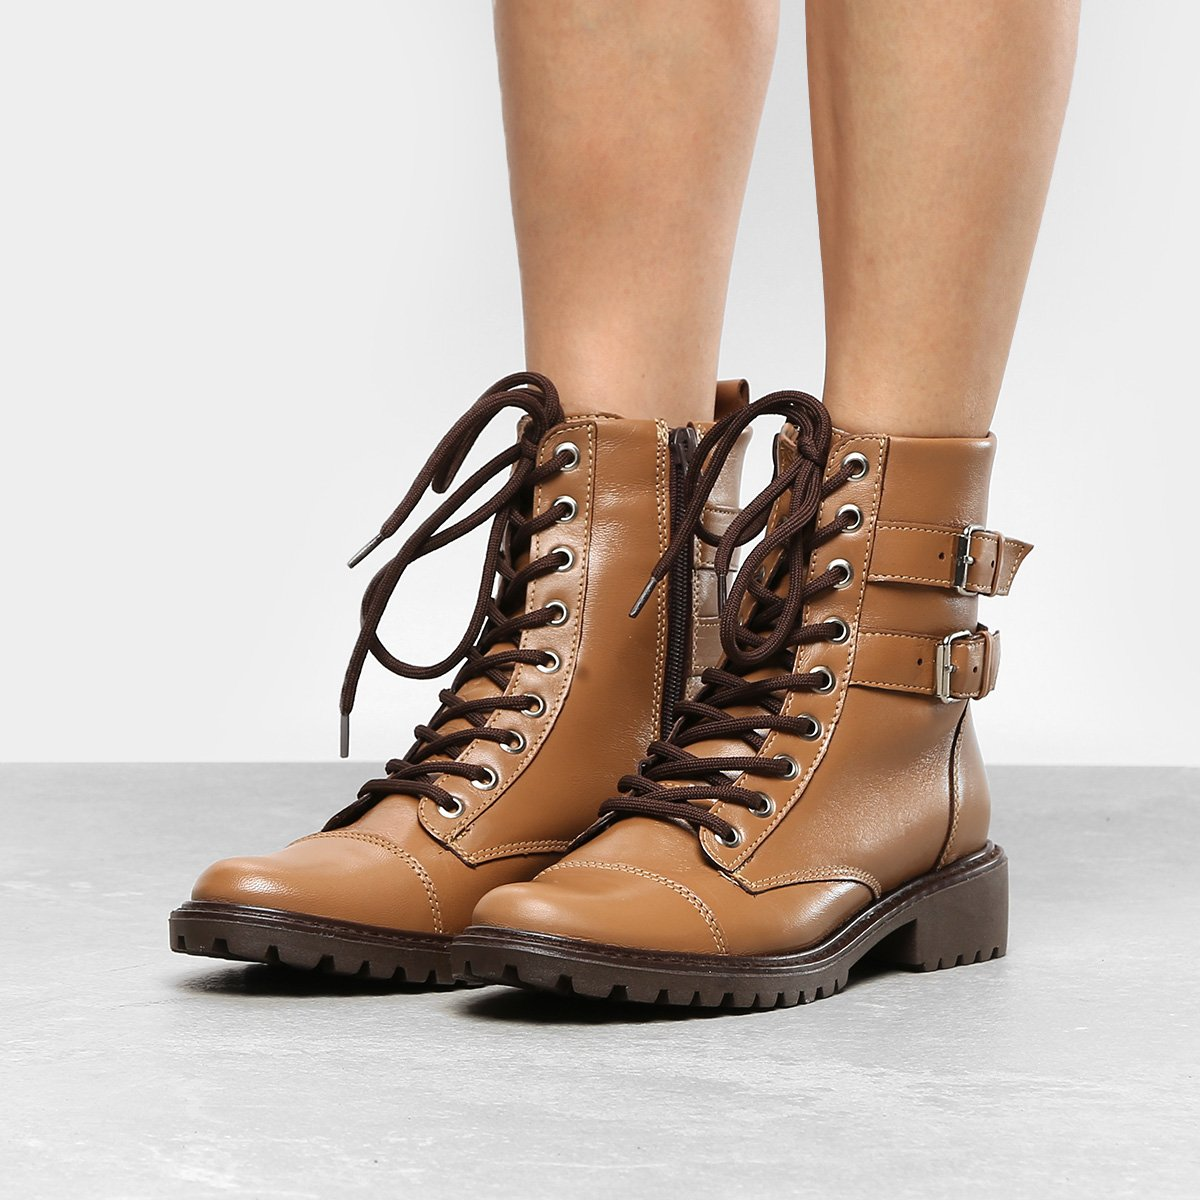 f8245bdc4eec9 ... Bota Coturno Shoestock Fivelas Feminina Caramelo Compre Agora